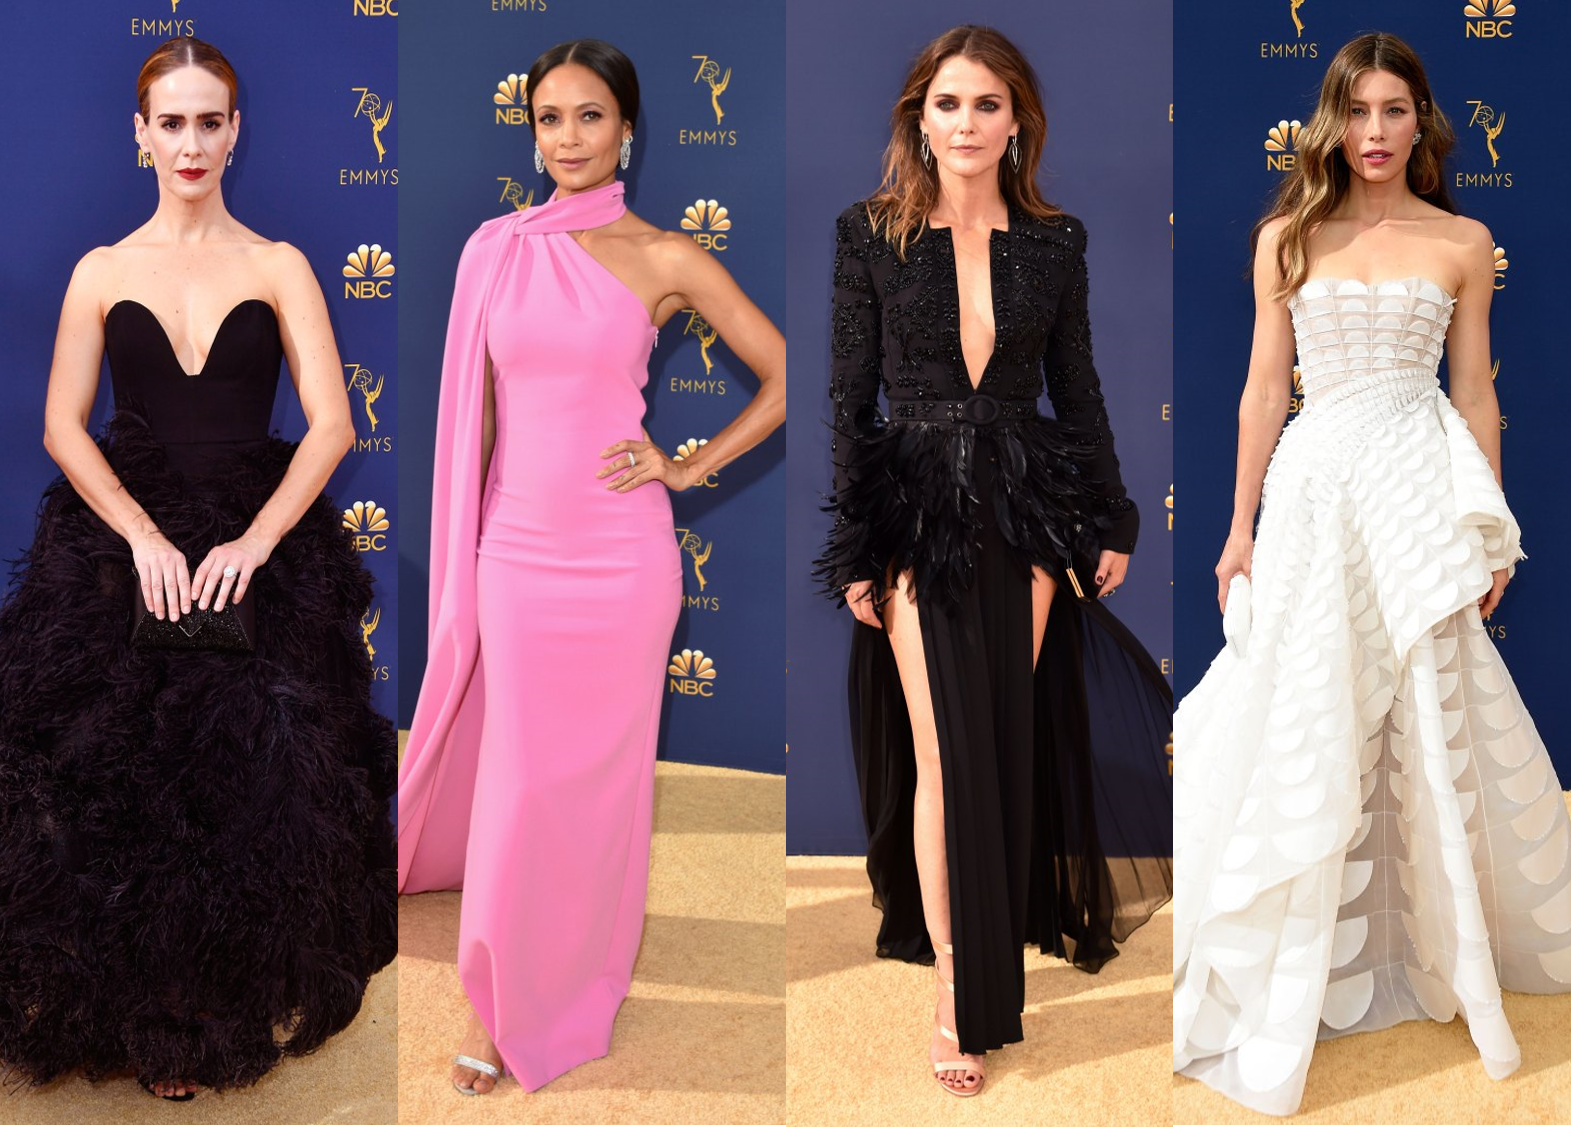 Emmys Best Dressed.png